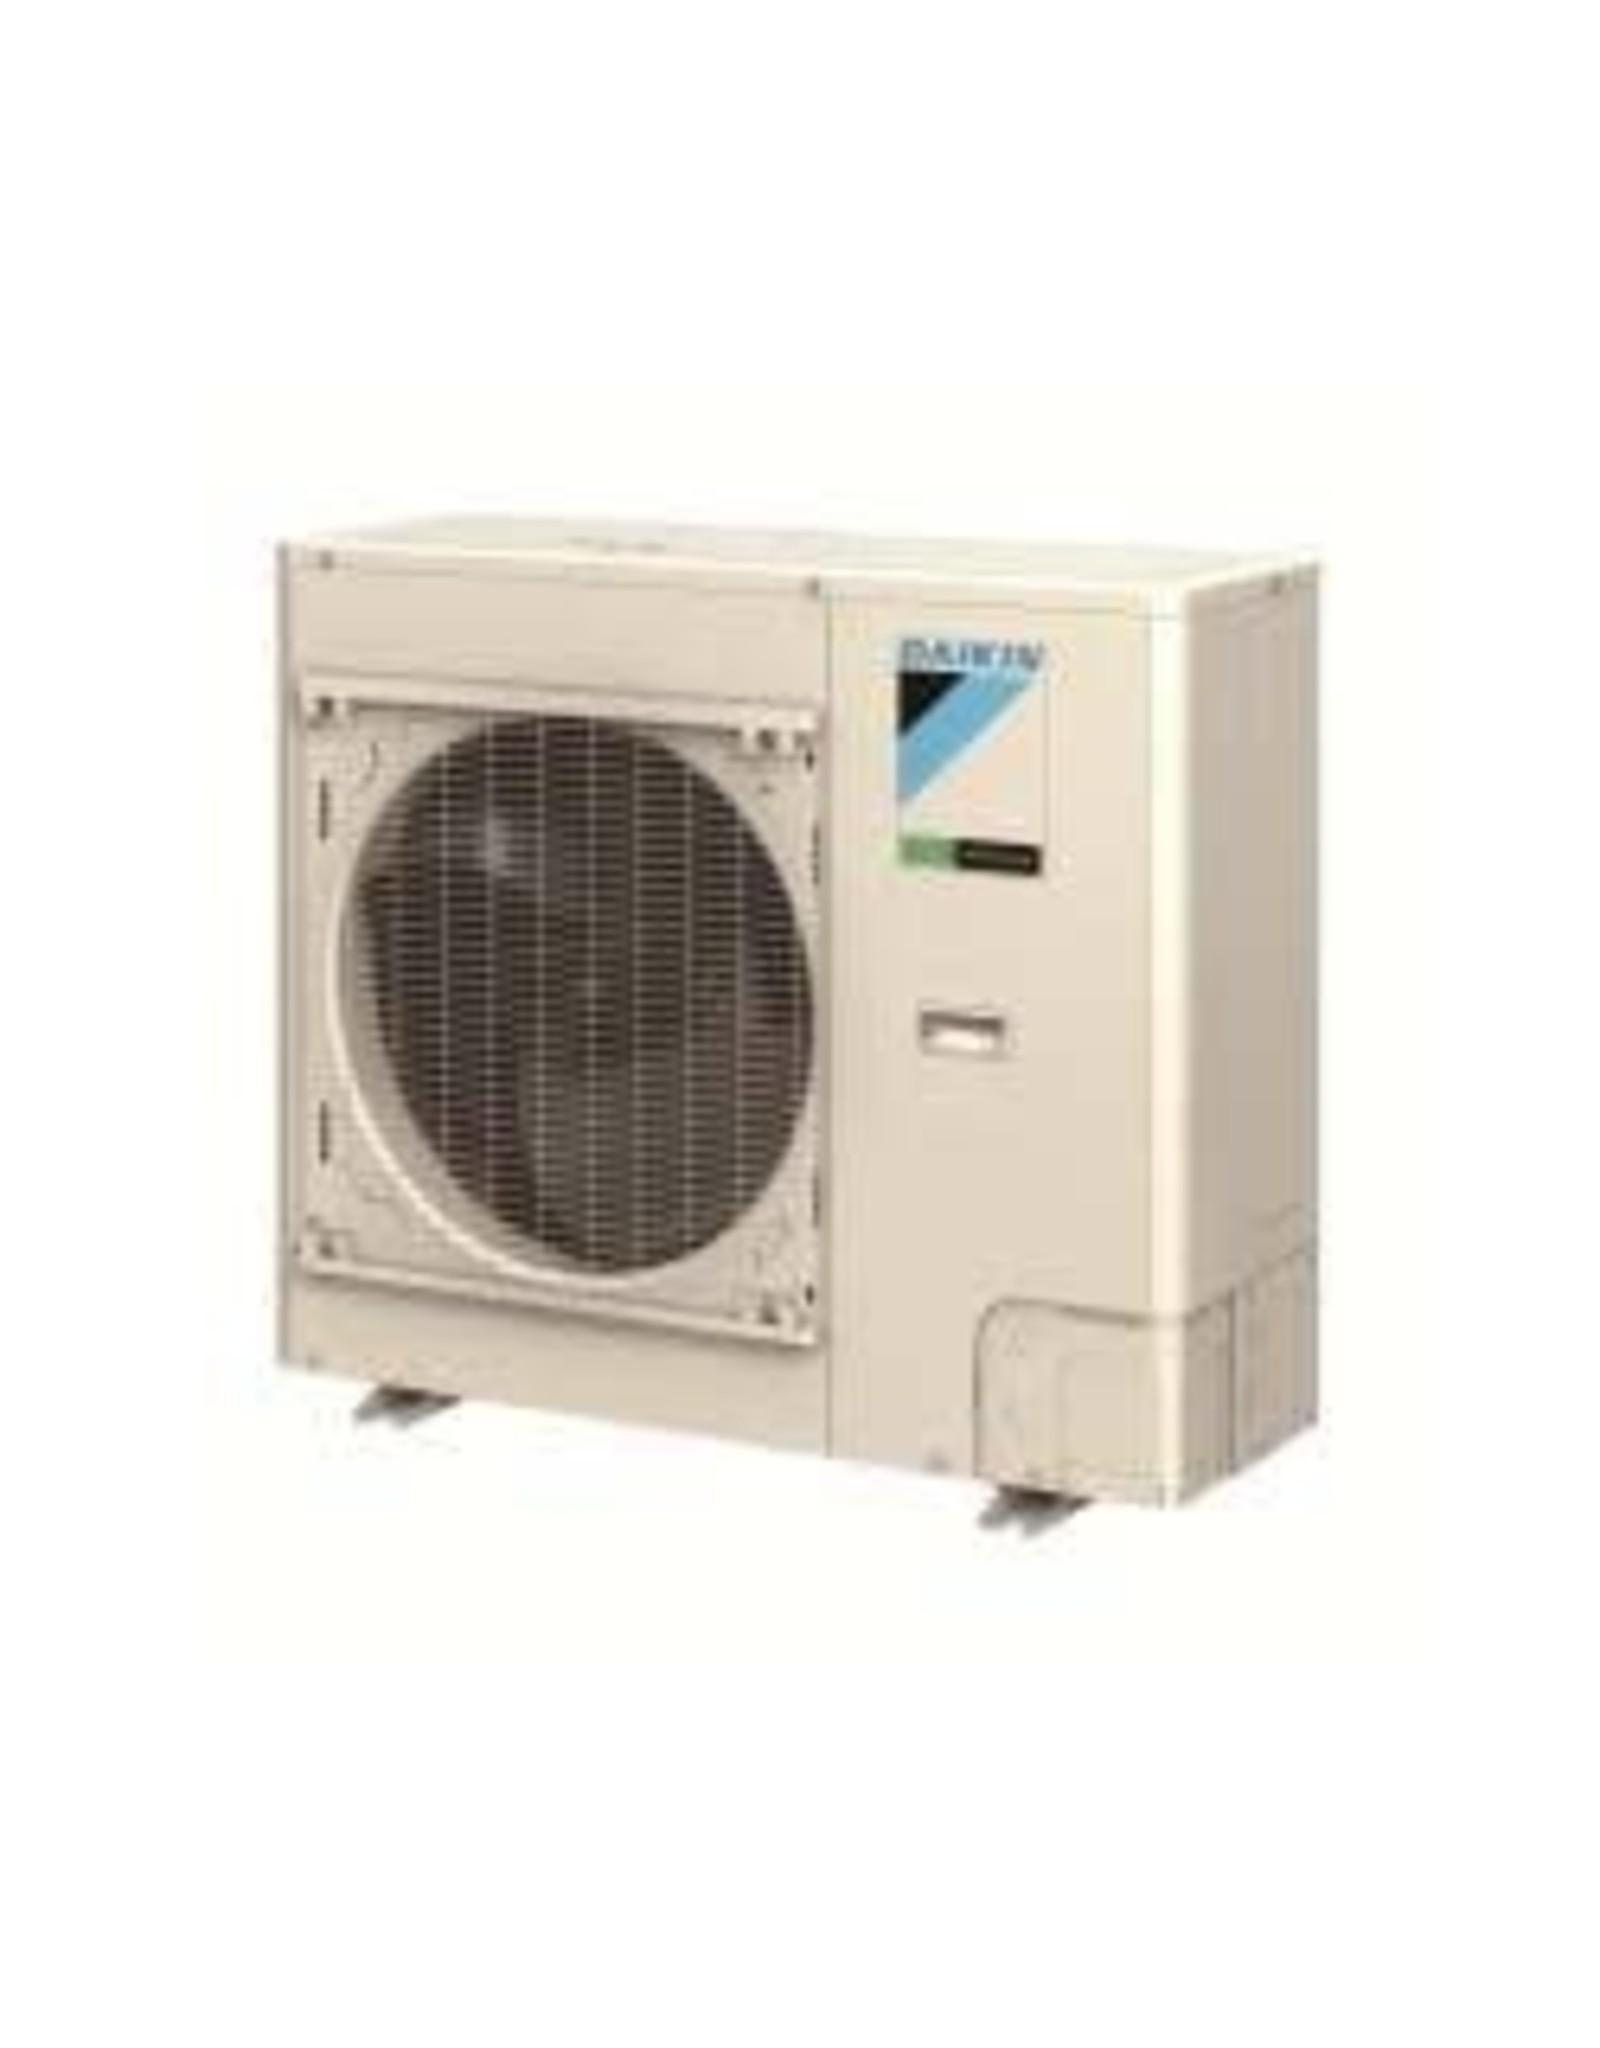 Daikin Applied Americas NV Series Cooling Single Zone Condenser Unit - 208/230v - 1ph